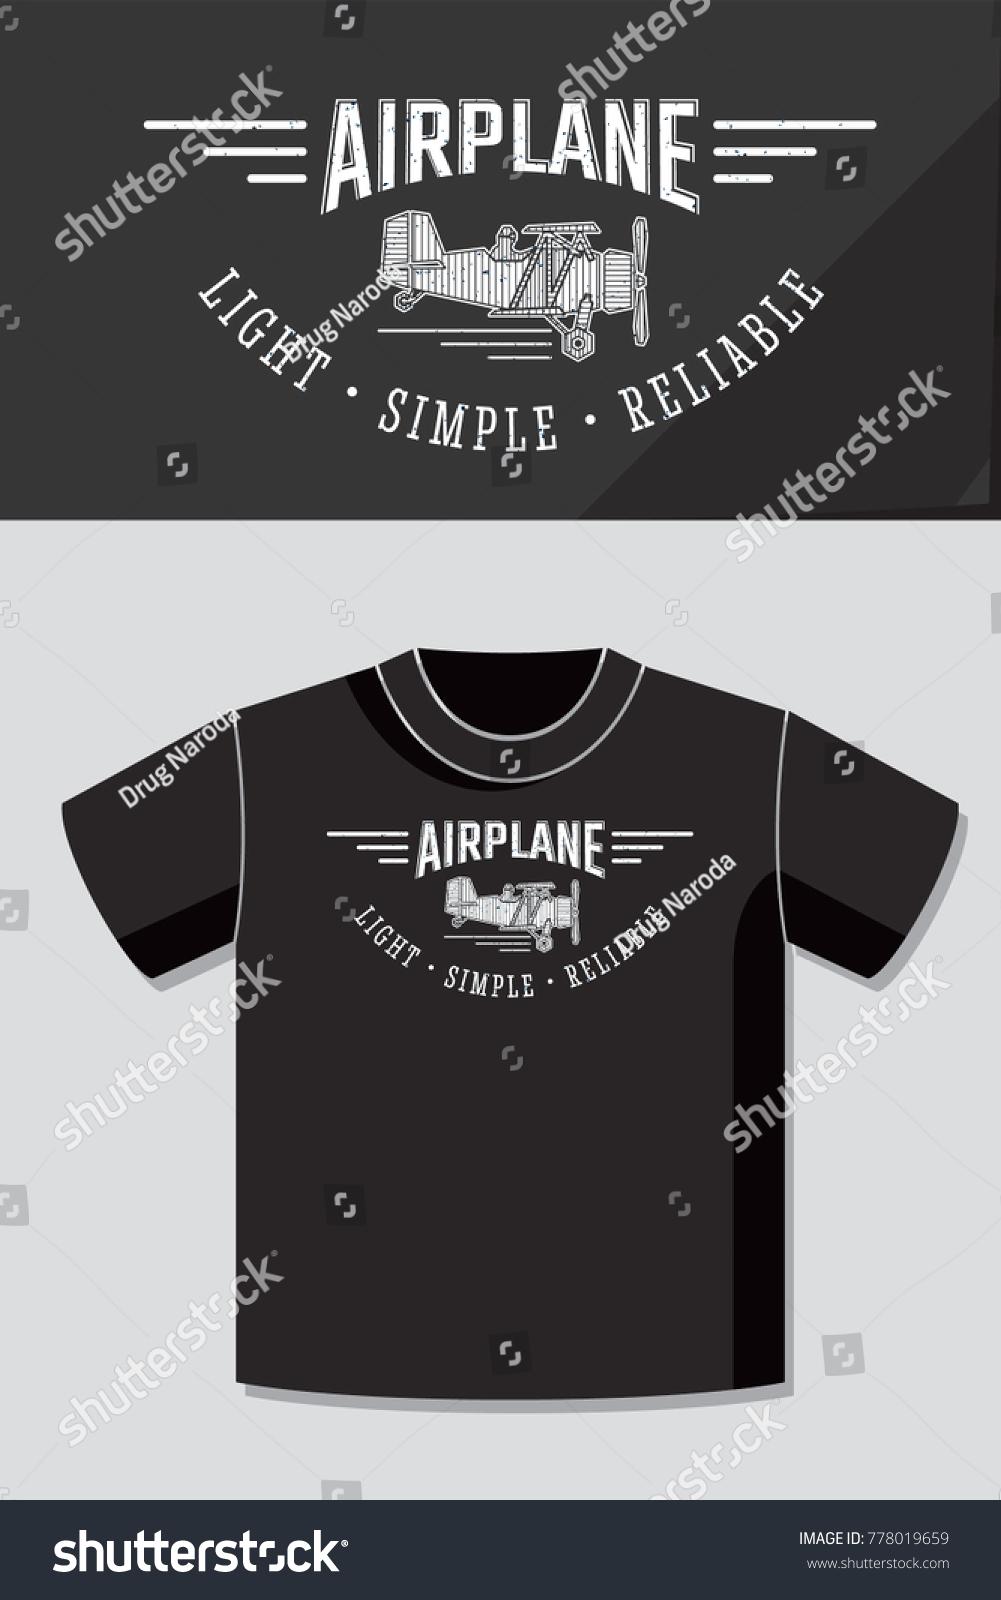 Free Graphic T Shirt Design Software « Alzheimer's Network of Oregon